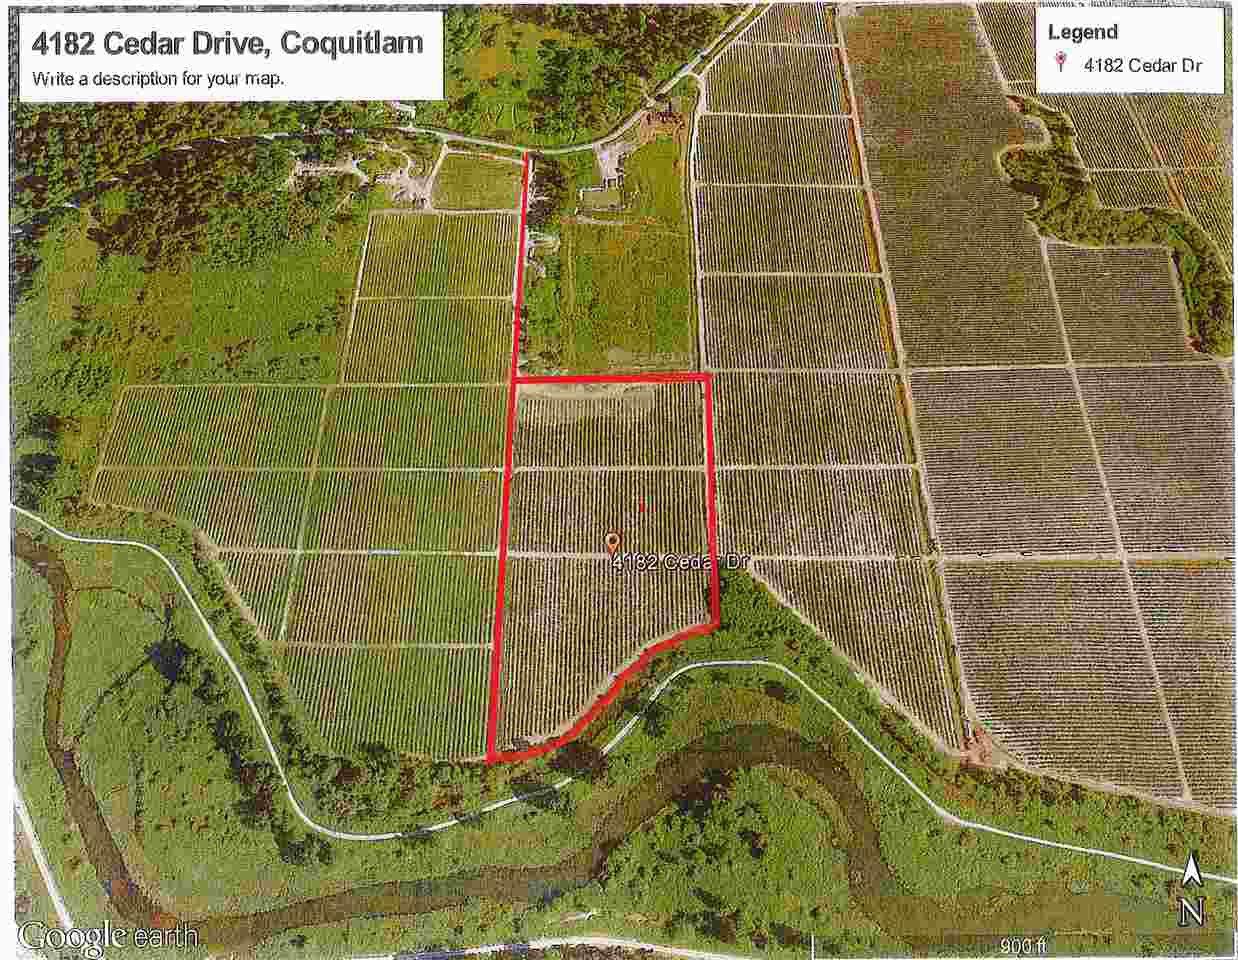 Main Photo: 4182 CEDAR Drive in Coquitlam: Burke Mountain Land for sale : MLS®# R2128701